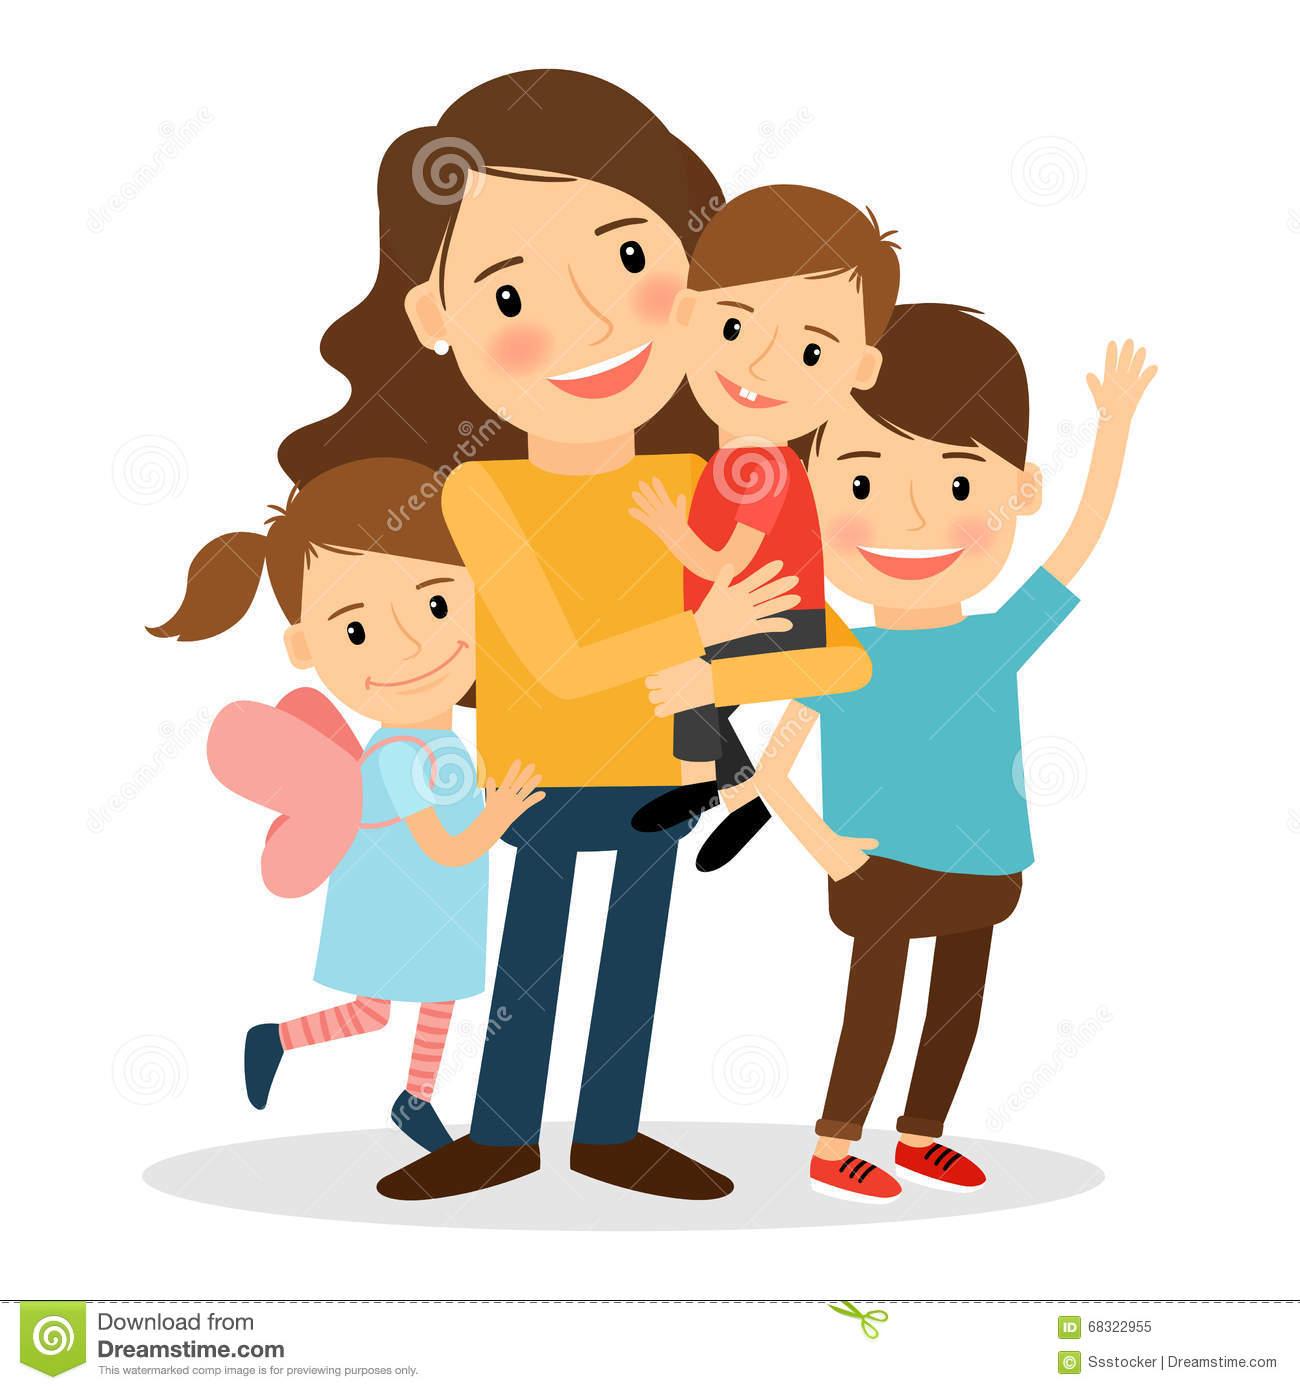 Babysitter cilpart amazing inspiration. Babysitting clipart kid clipart